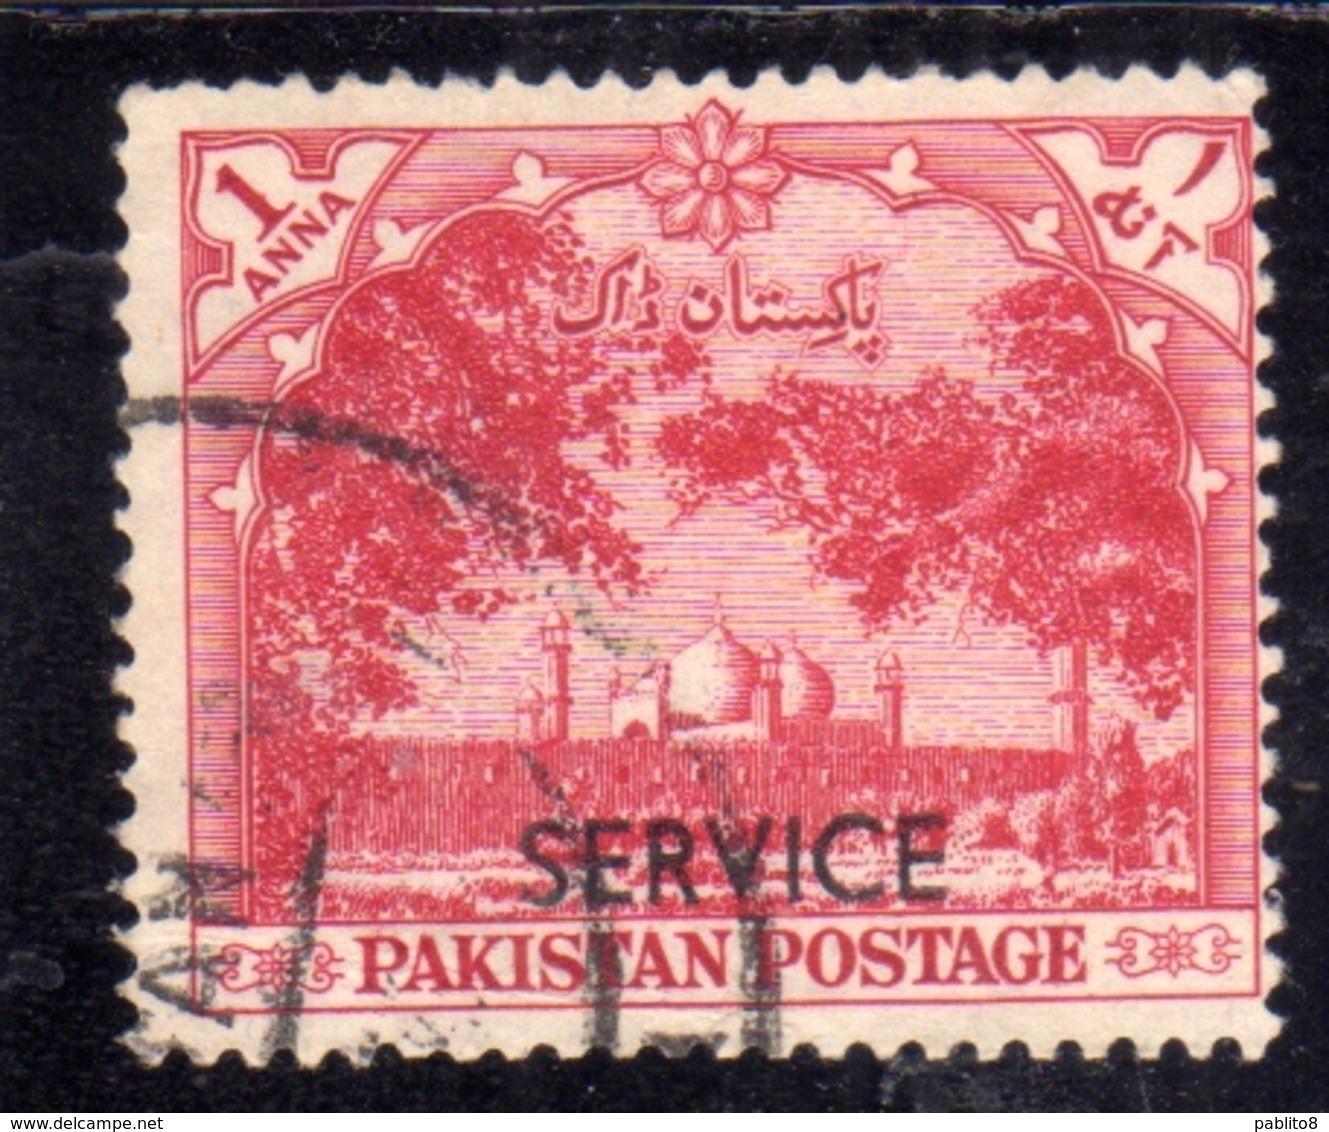 PAKISTAN 1954 OFFICIAL STAMPS LANDSCAPE BADSHAHI MOSQUE MASJID SERVICE OVERPRINTED 1a USED USATO OBLITERE - Pakistan